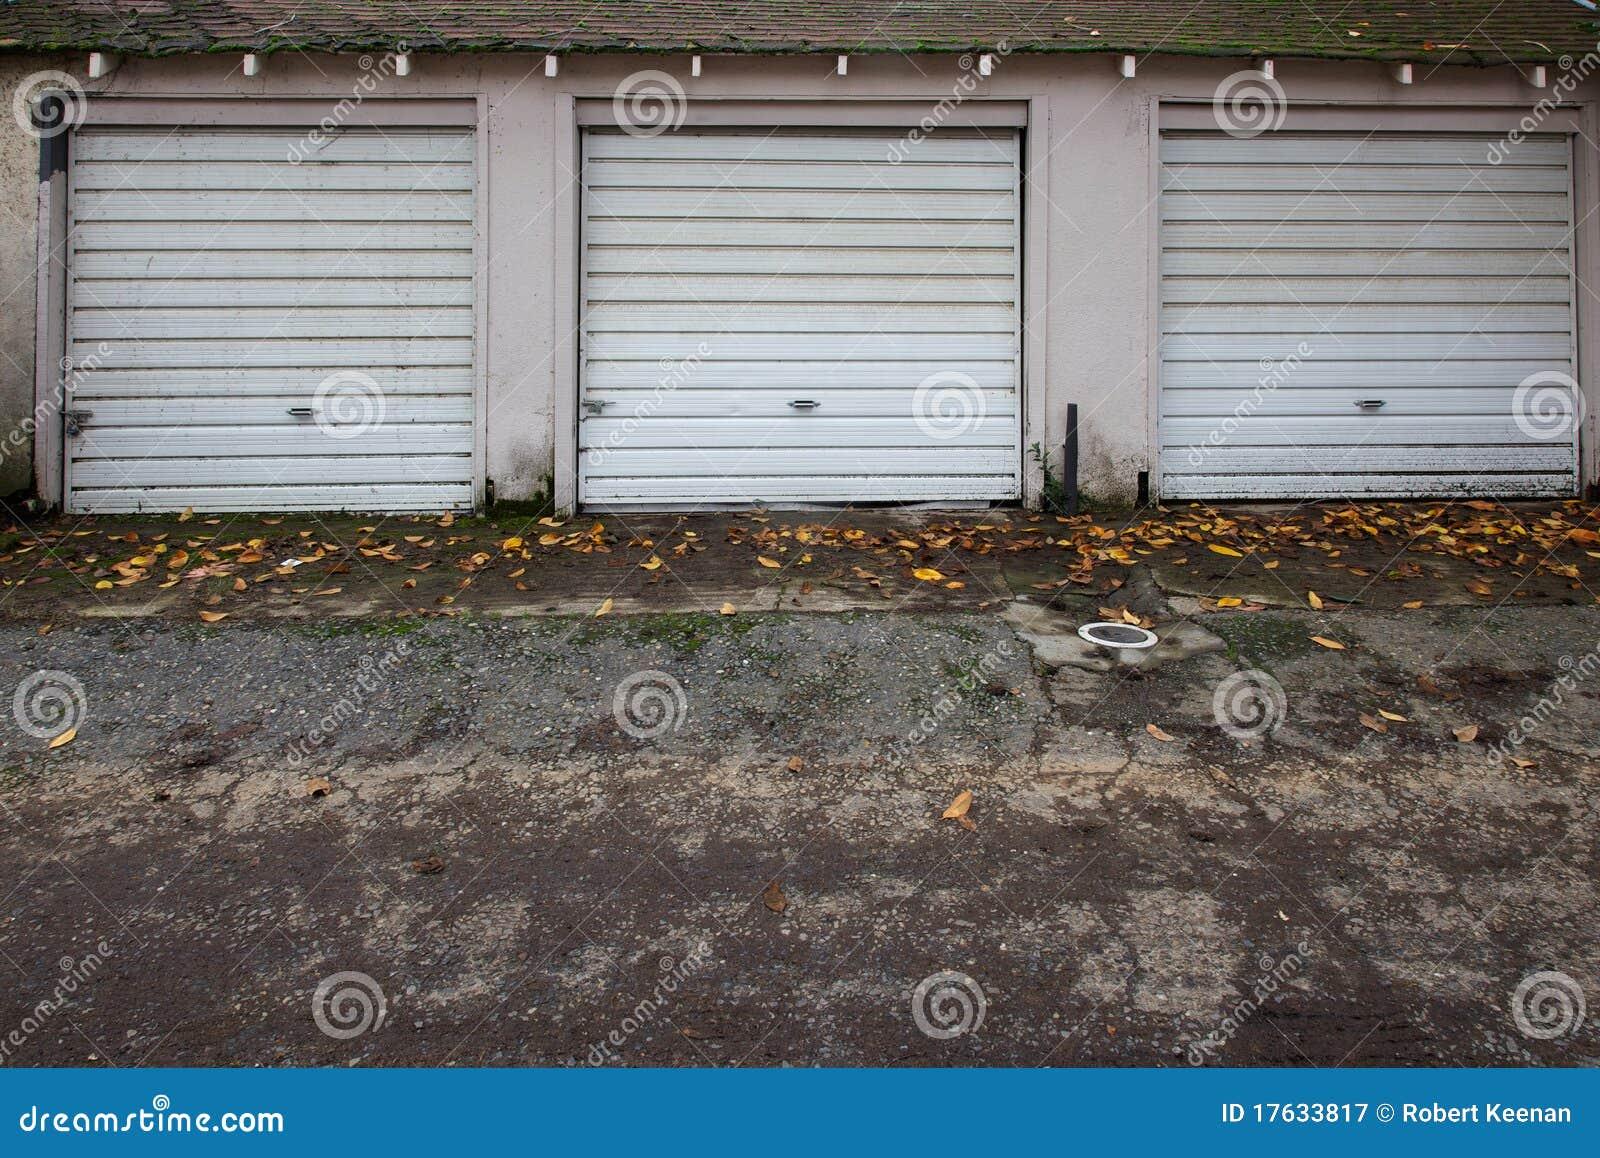 Three Old Garage Doors Royalty Free Stock Photography